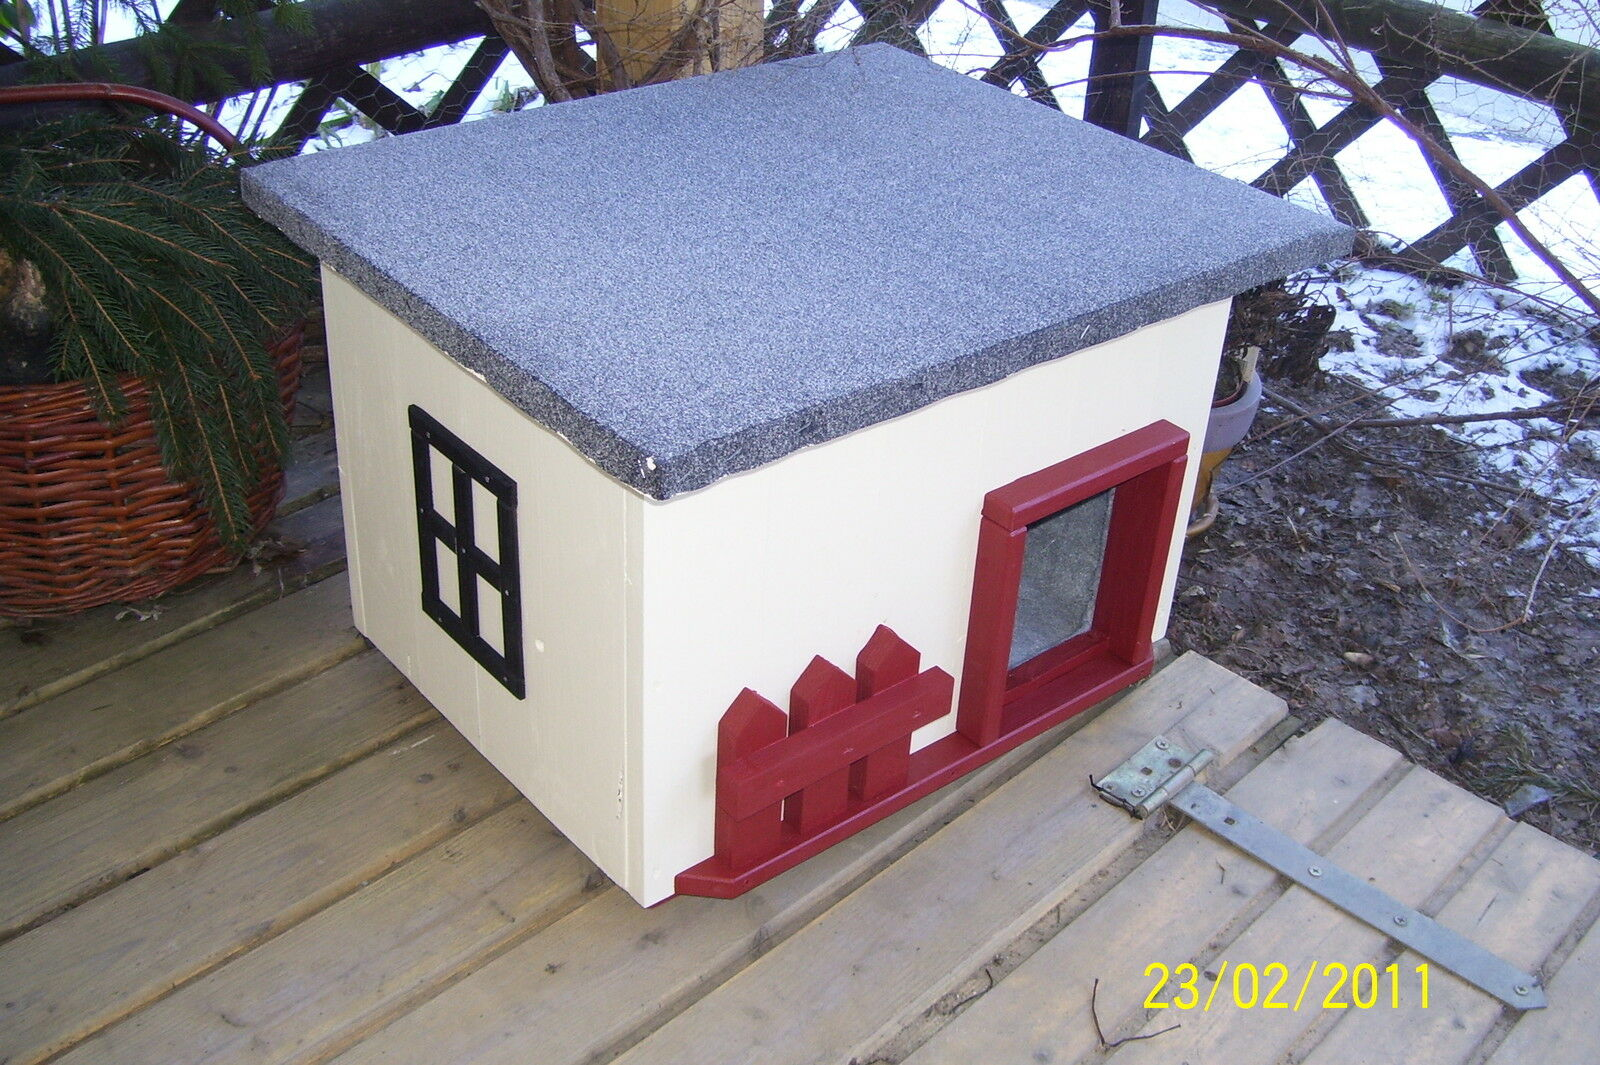 Katzenhaus Beheizt - Katzenhaus mit Heizung - beheiztes Katzenhaus